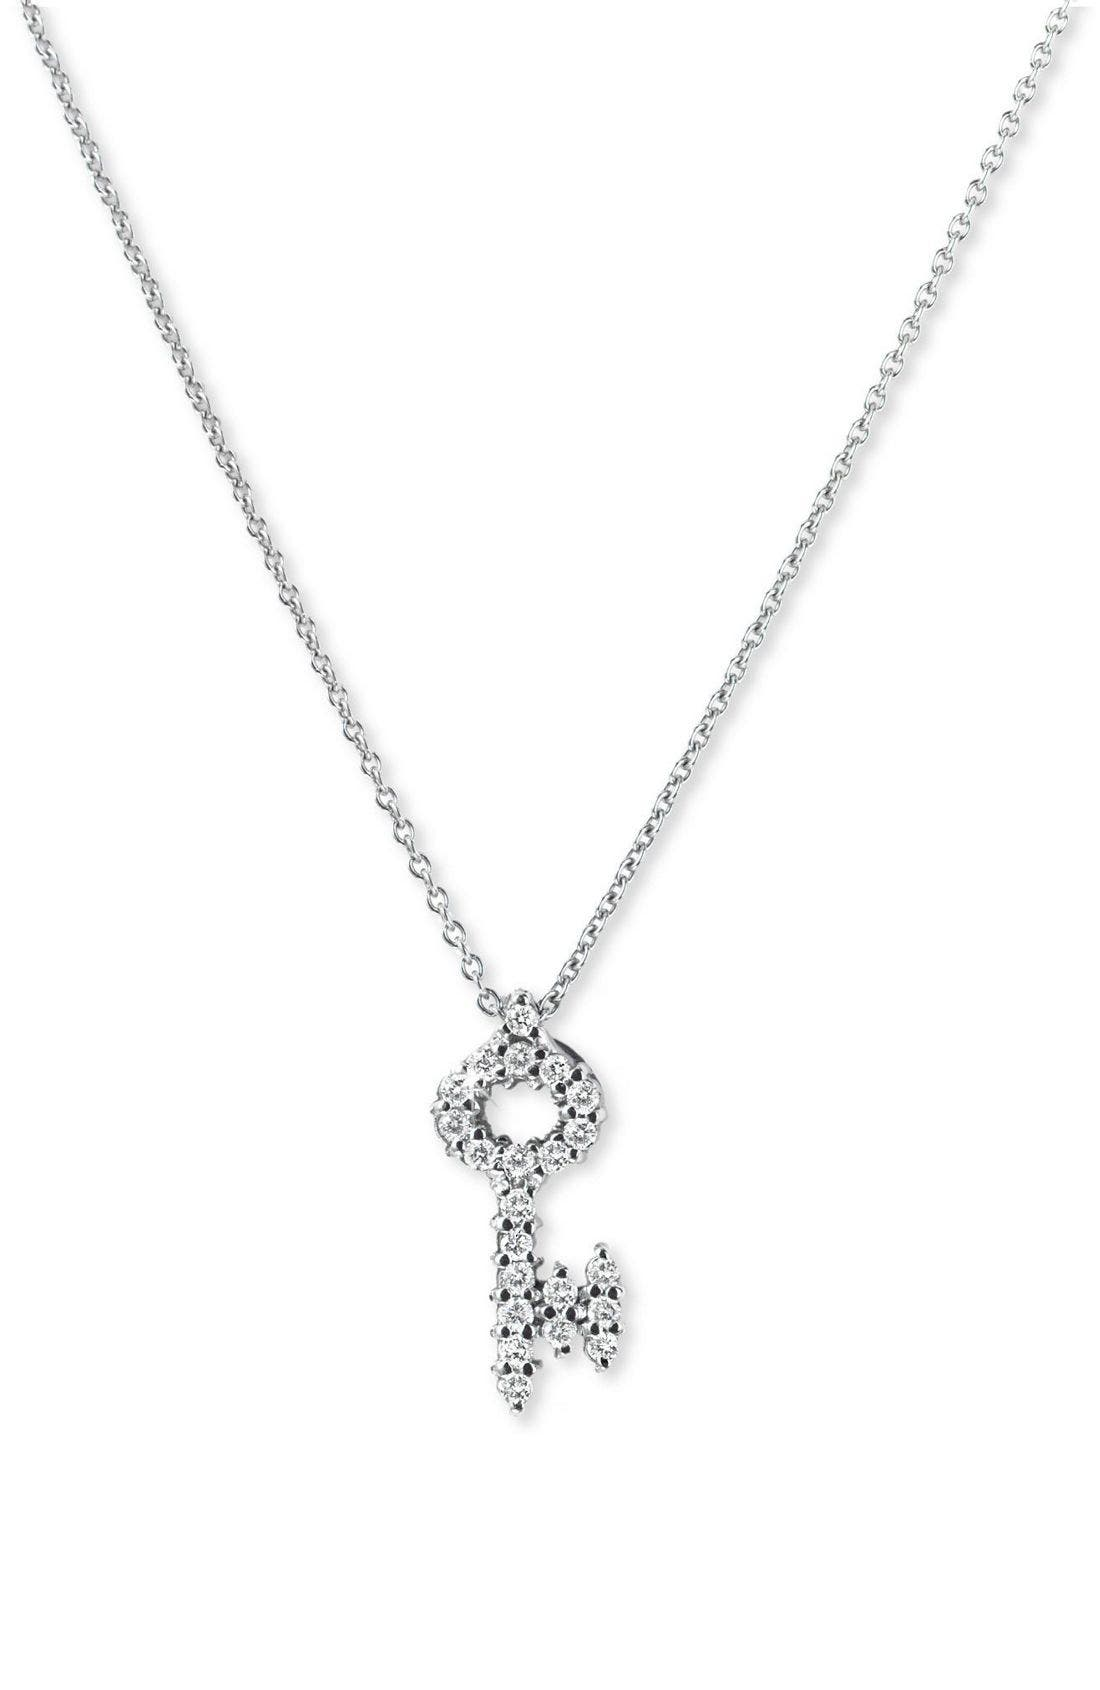 Alternate Image 1 Selected - Roberto Coin 'Tiny Treasures' Diamond Baby Key Necklace